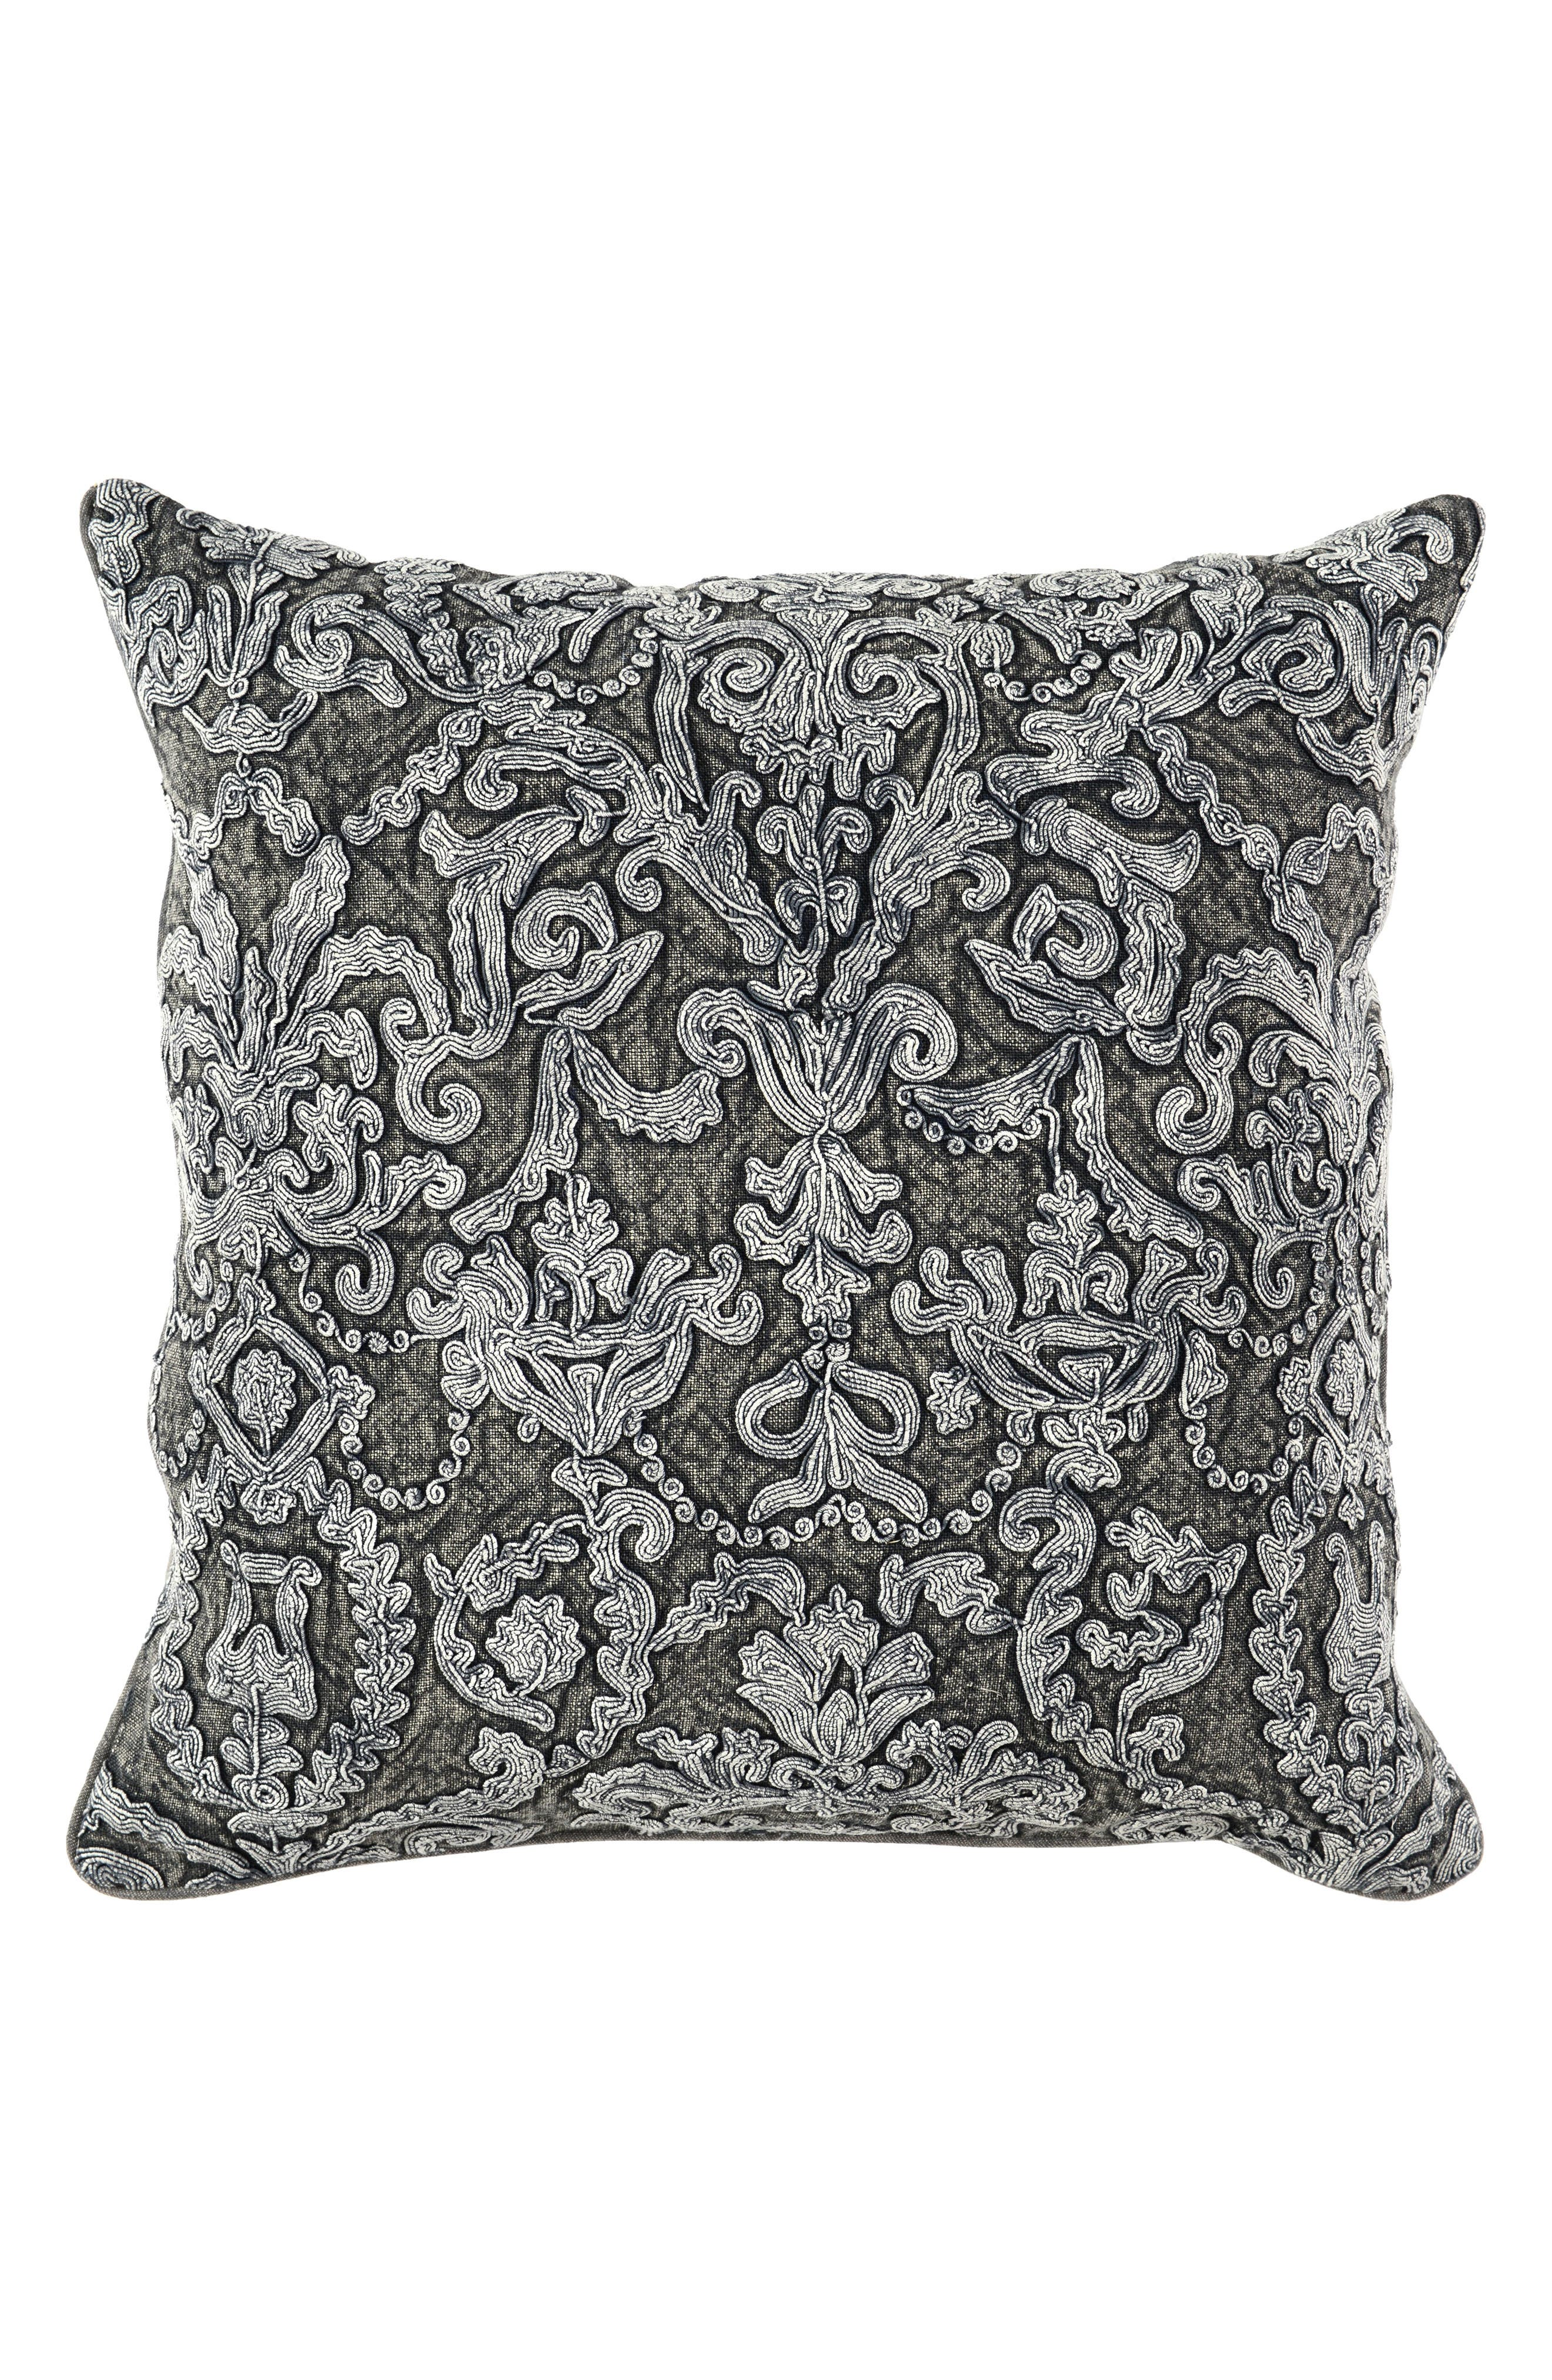 Empress Linen Accent Pillow,                             Main thumbnail 1, color,                             CHARCOAL